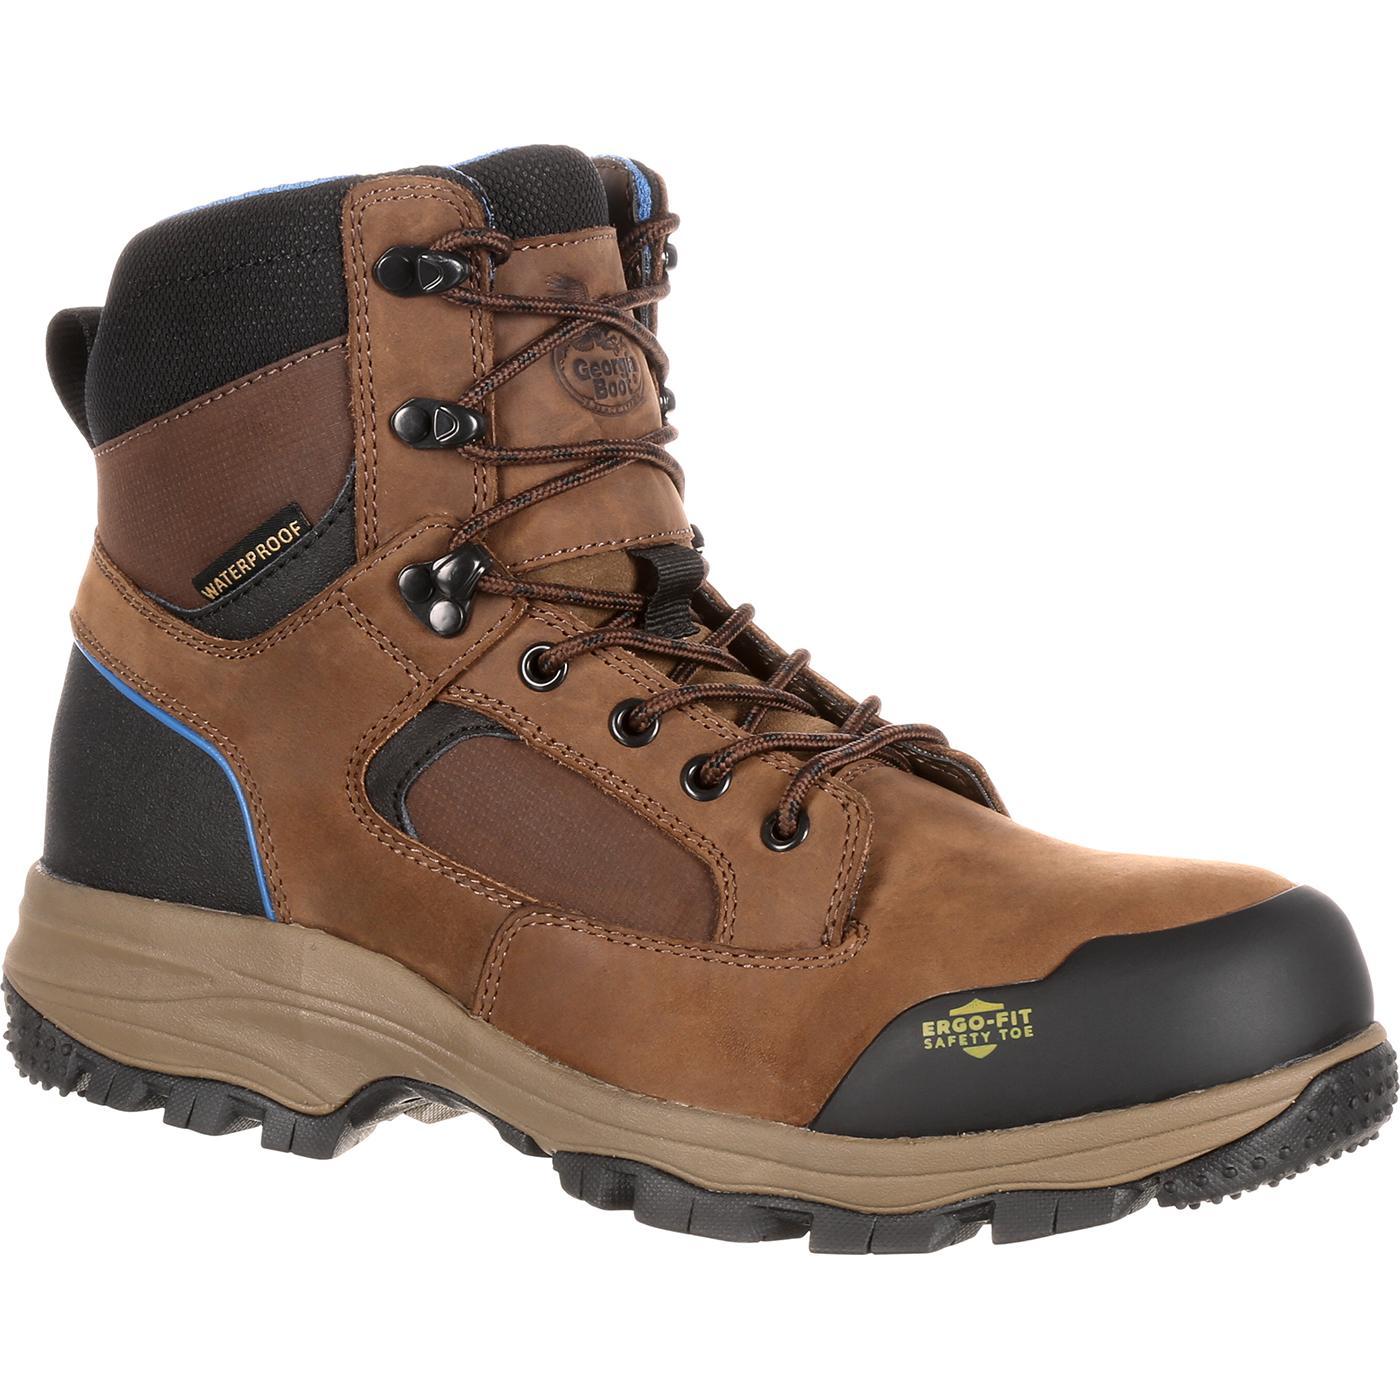 55c5bd9844a Georgia Boot Blue Collar Composite Toe Waterproof Work Hiker